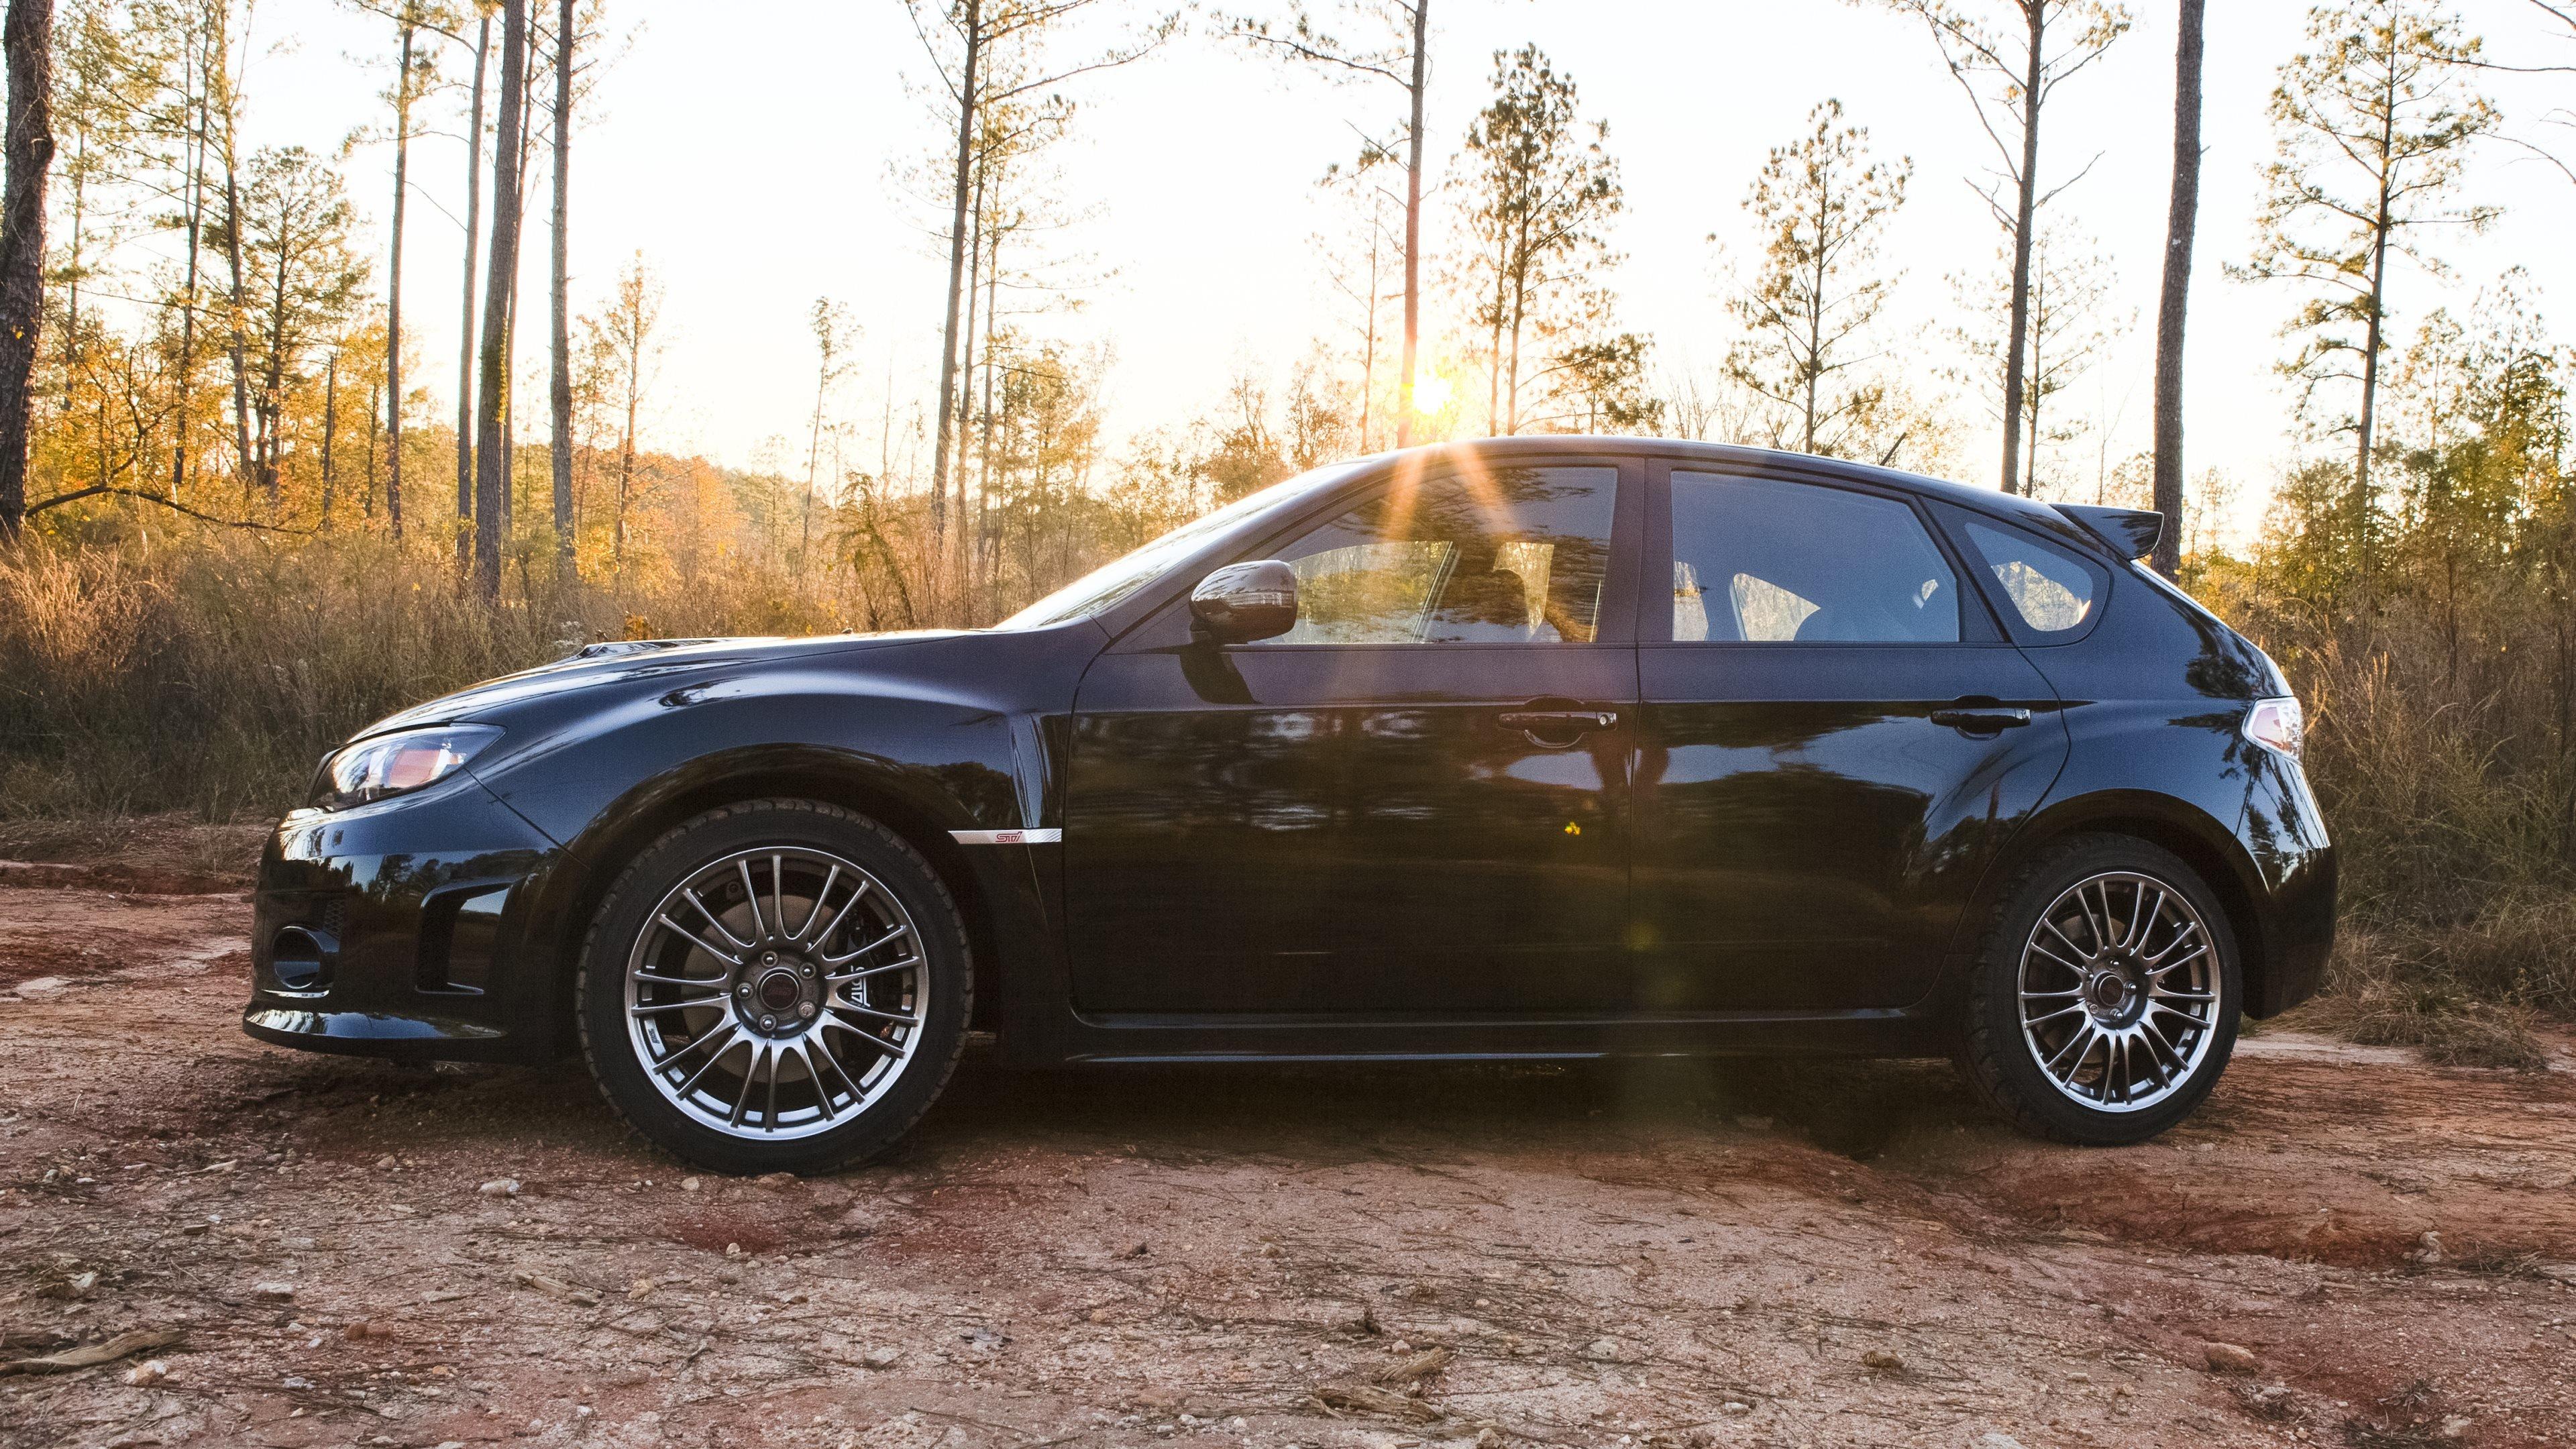 Subaru Impreza Wrx Sti Wallpapers 3840x2160 Ultra Hd 4k Desktop